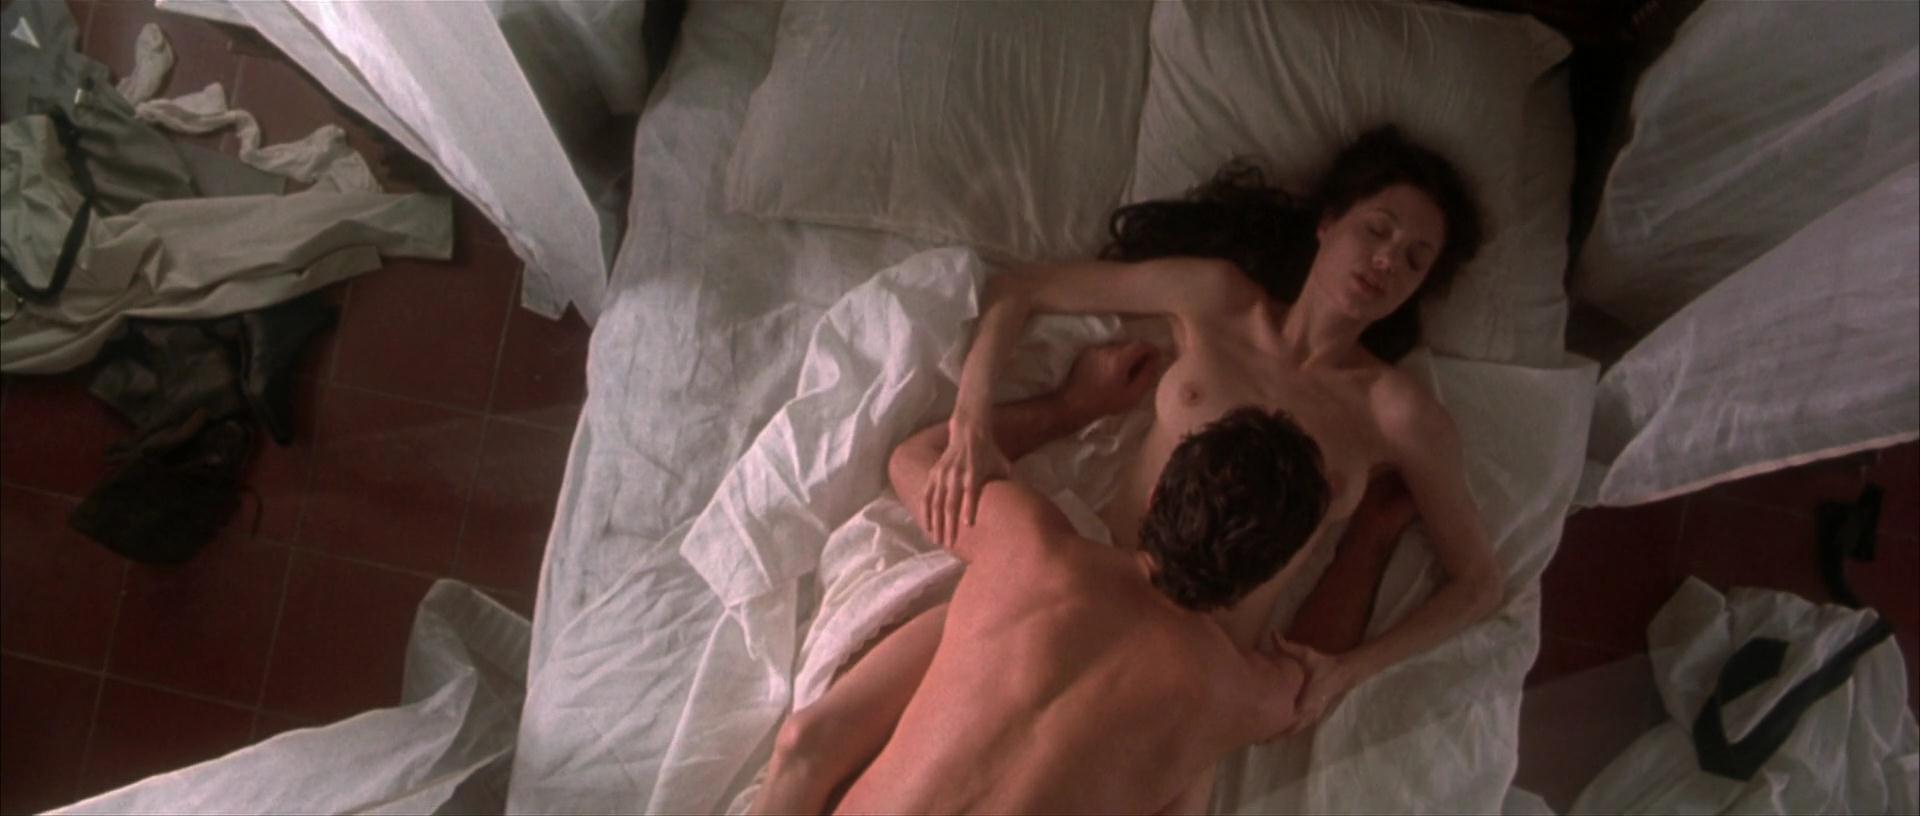 That Original sin nude sex valuable information